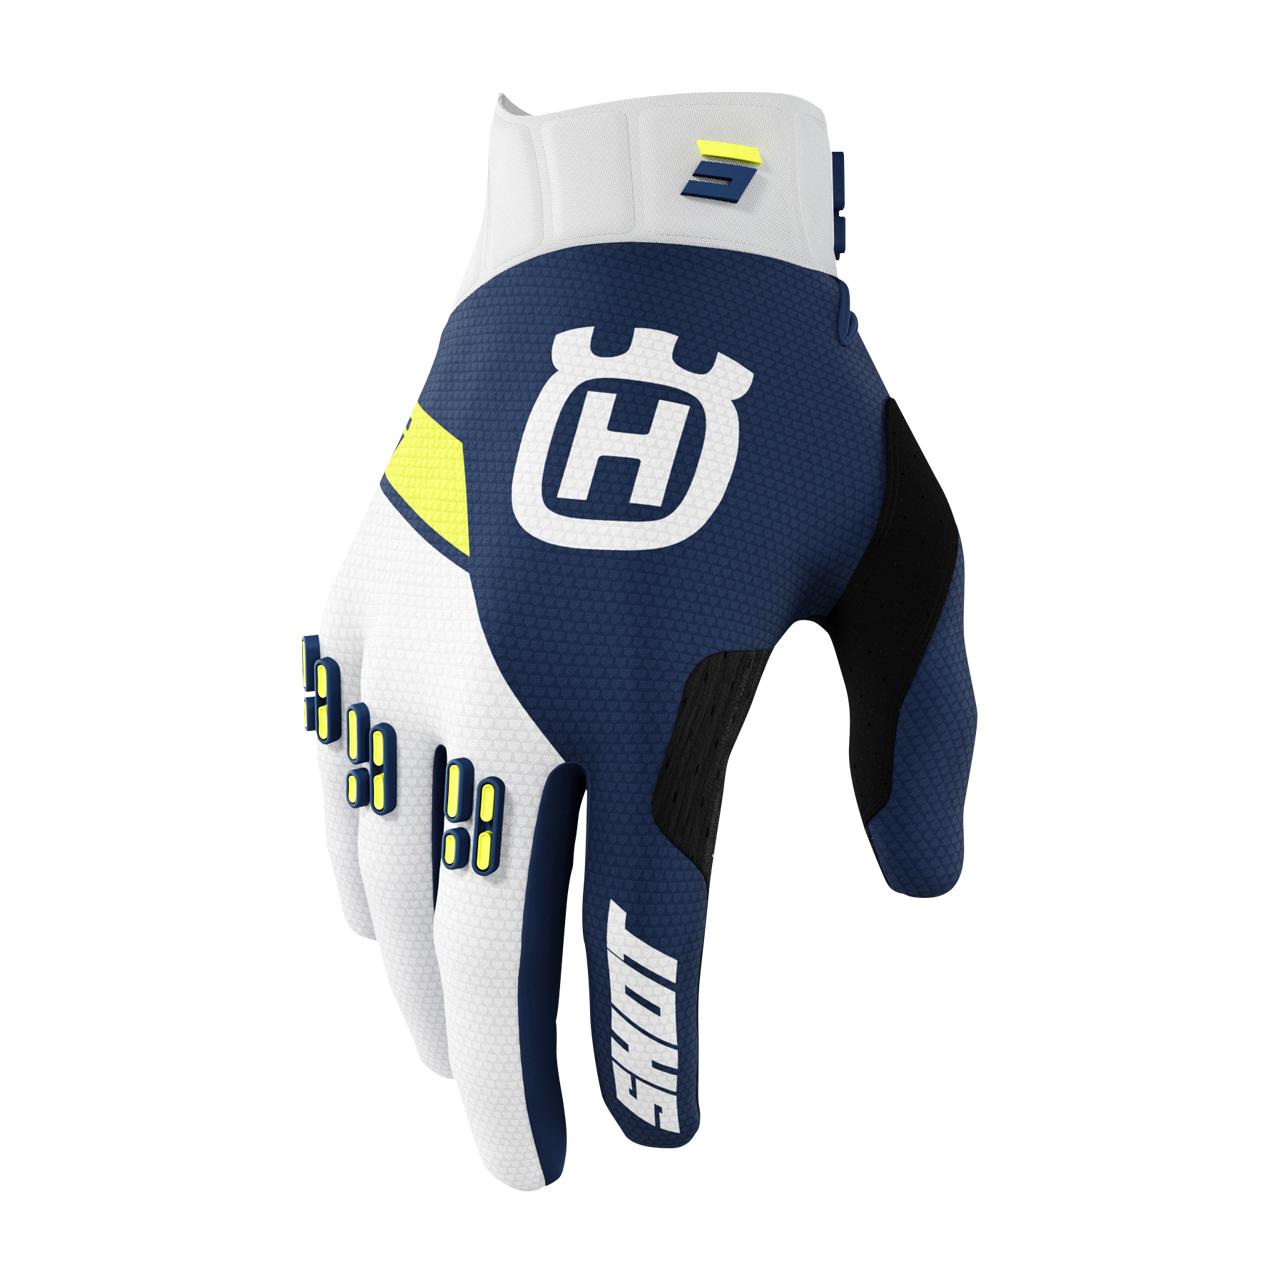 Shot Race Gear Gants Cross Shot Husqvarna Limited Edition 2022 Bleus